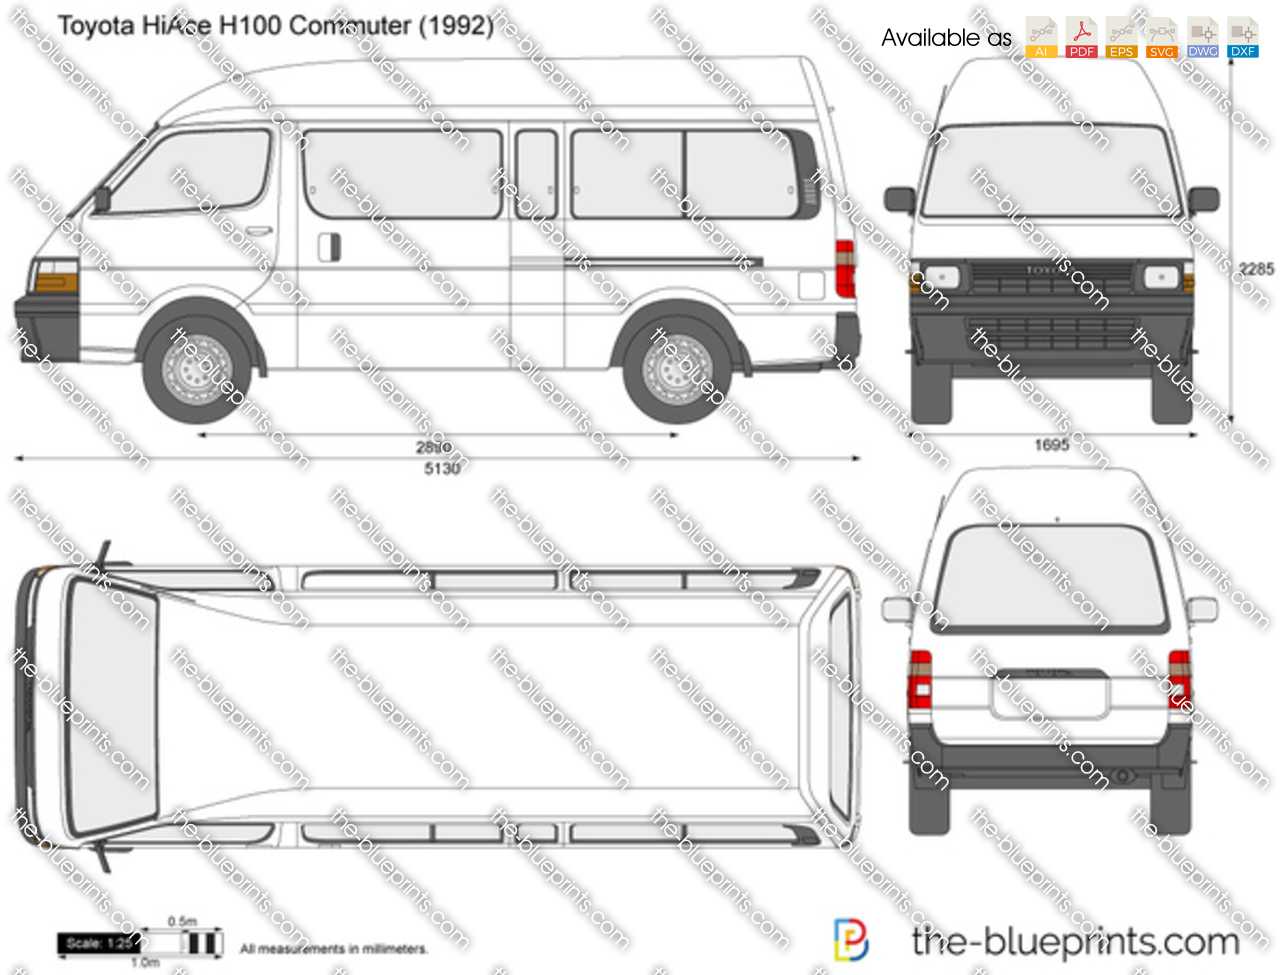 Toyota HiAce H100 Commuter 2000